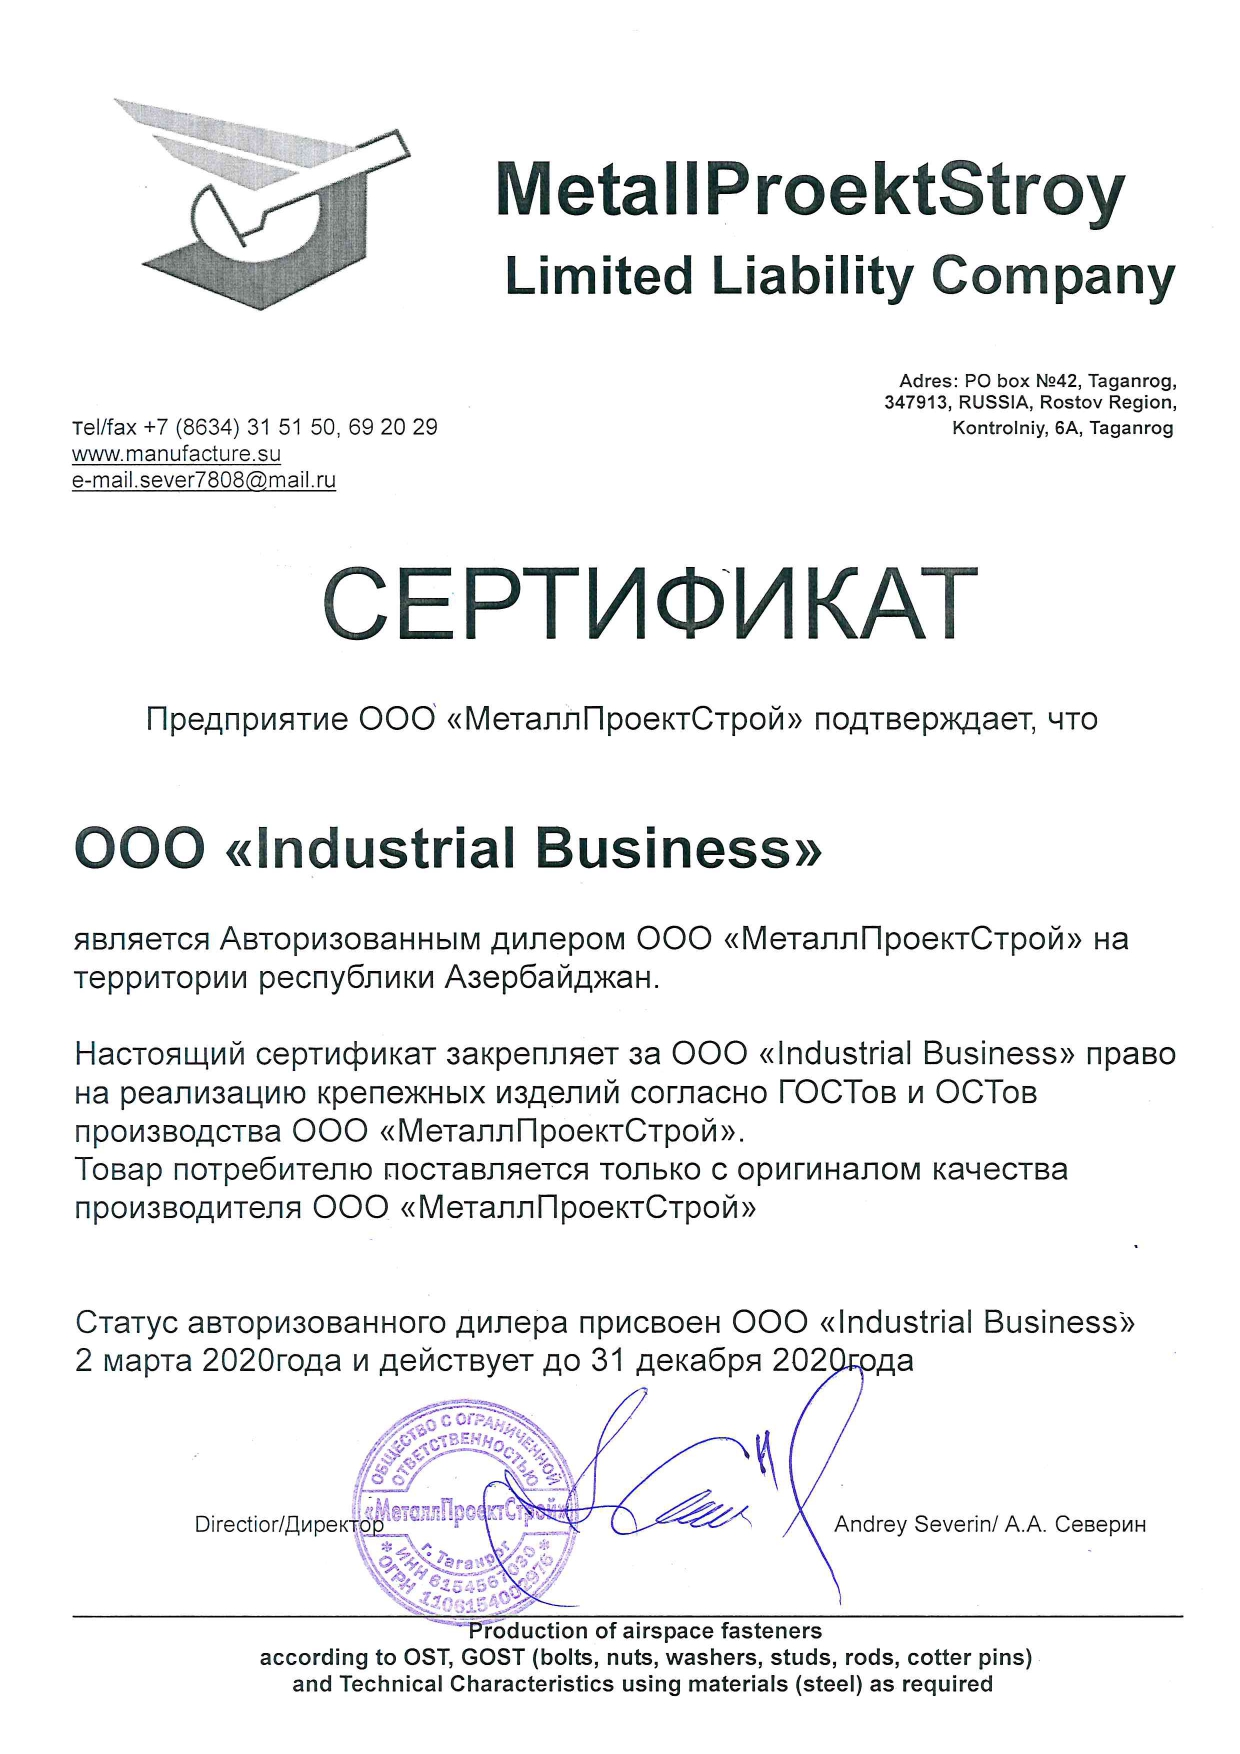 MetallProektStroy LLC